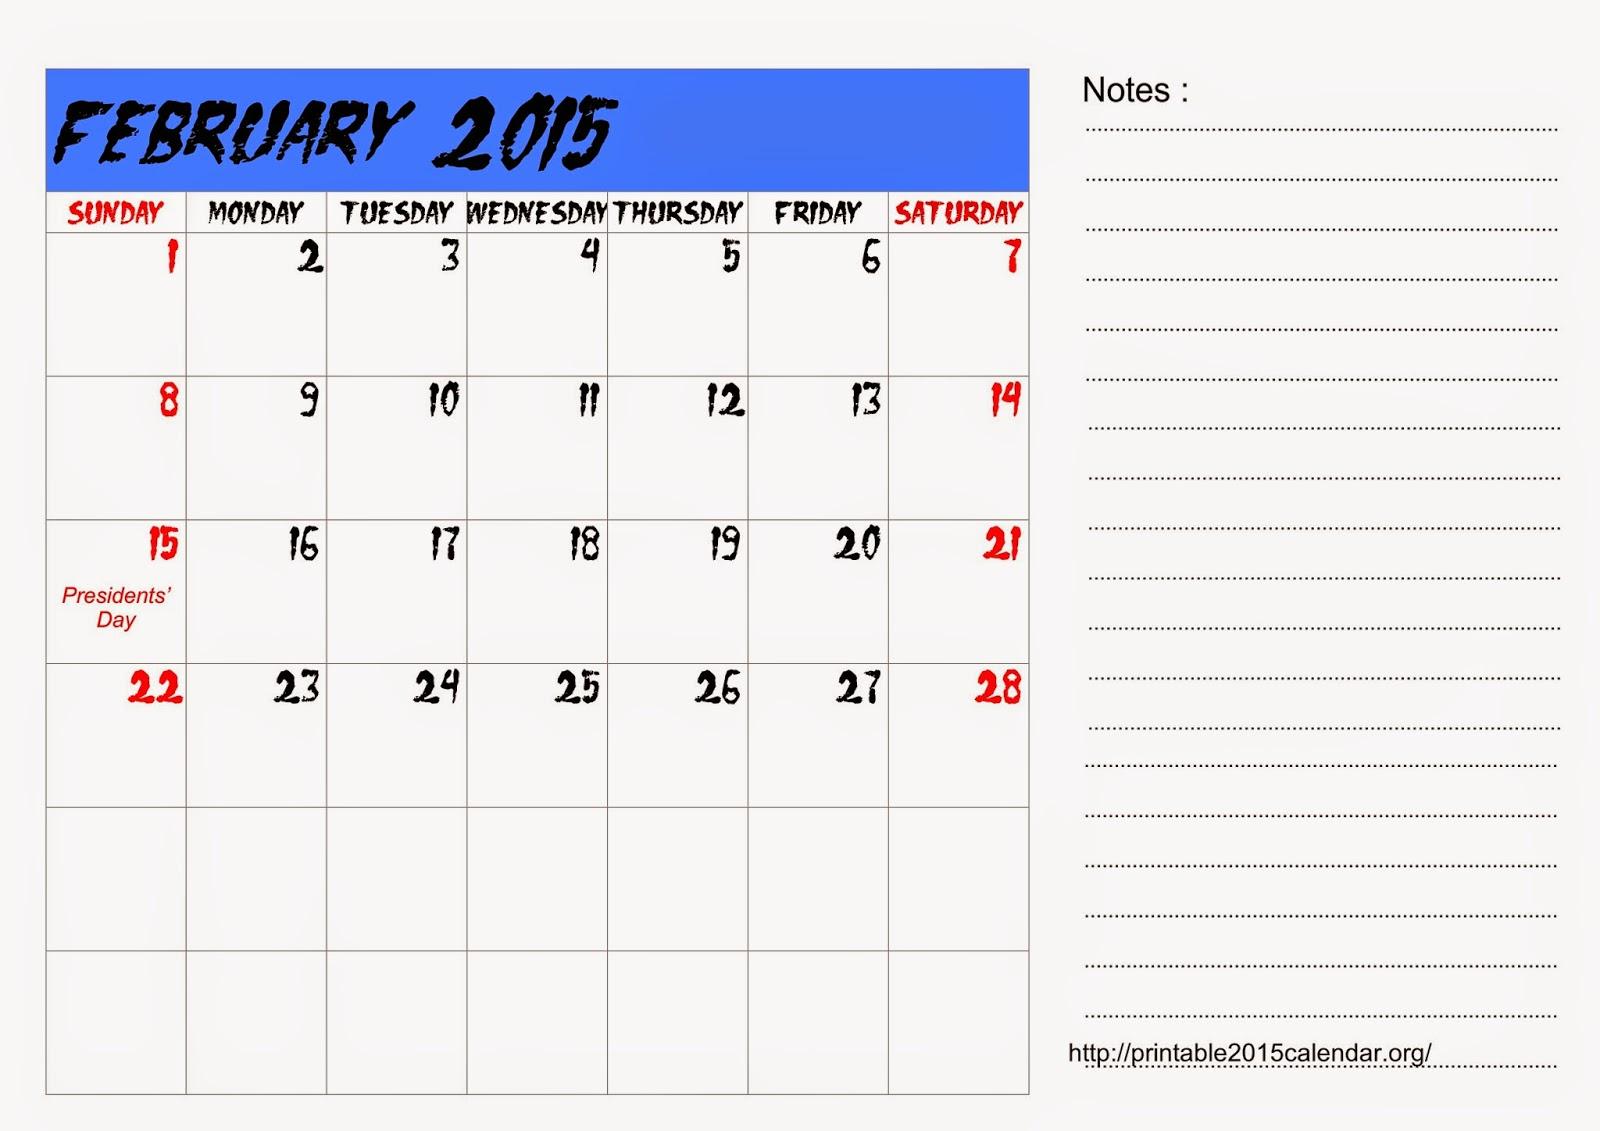 Calendar Template February 2015 Kubreforic